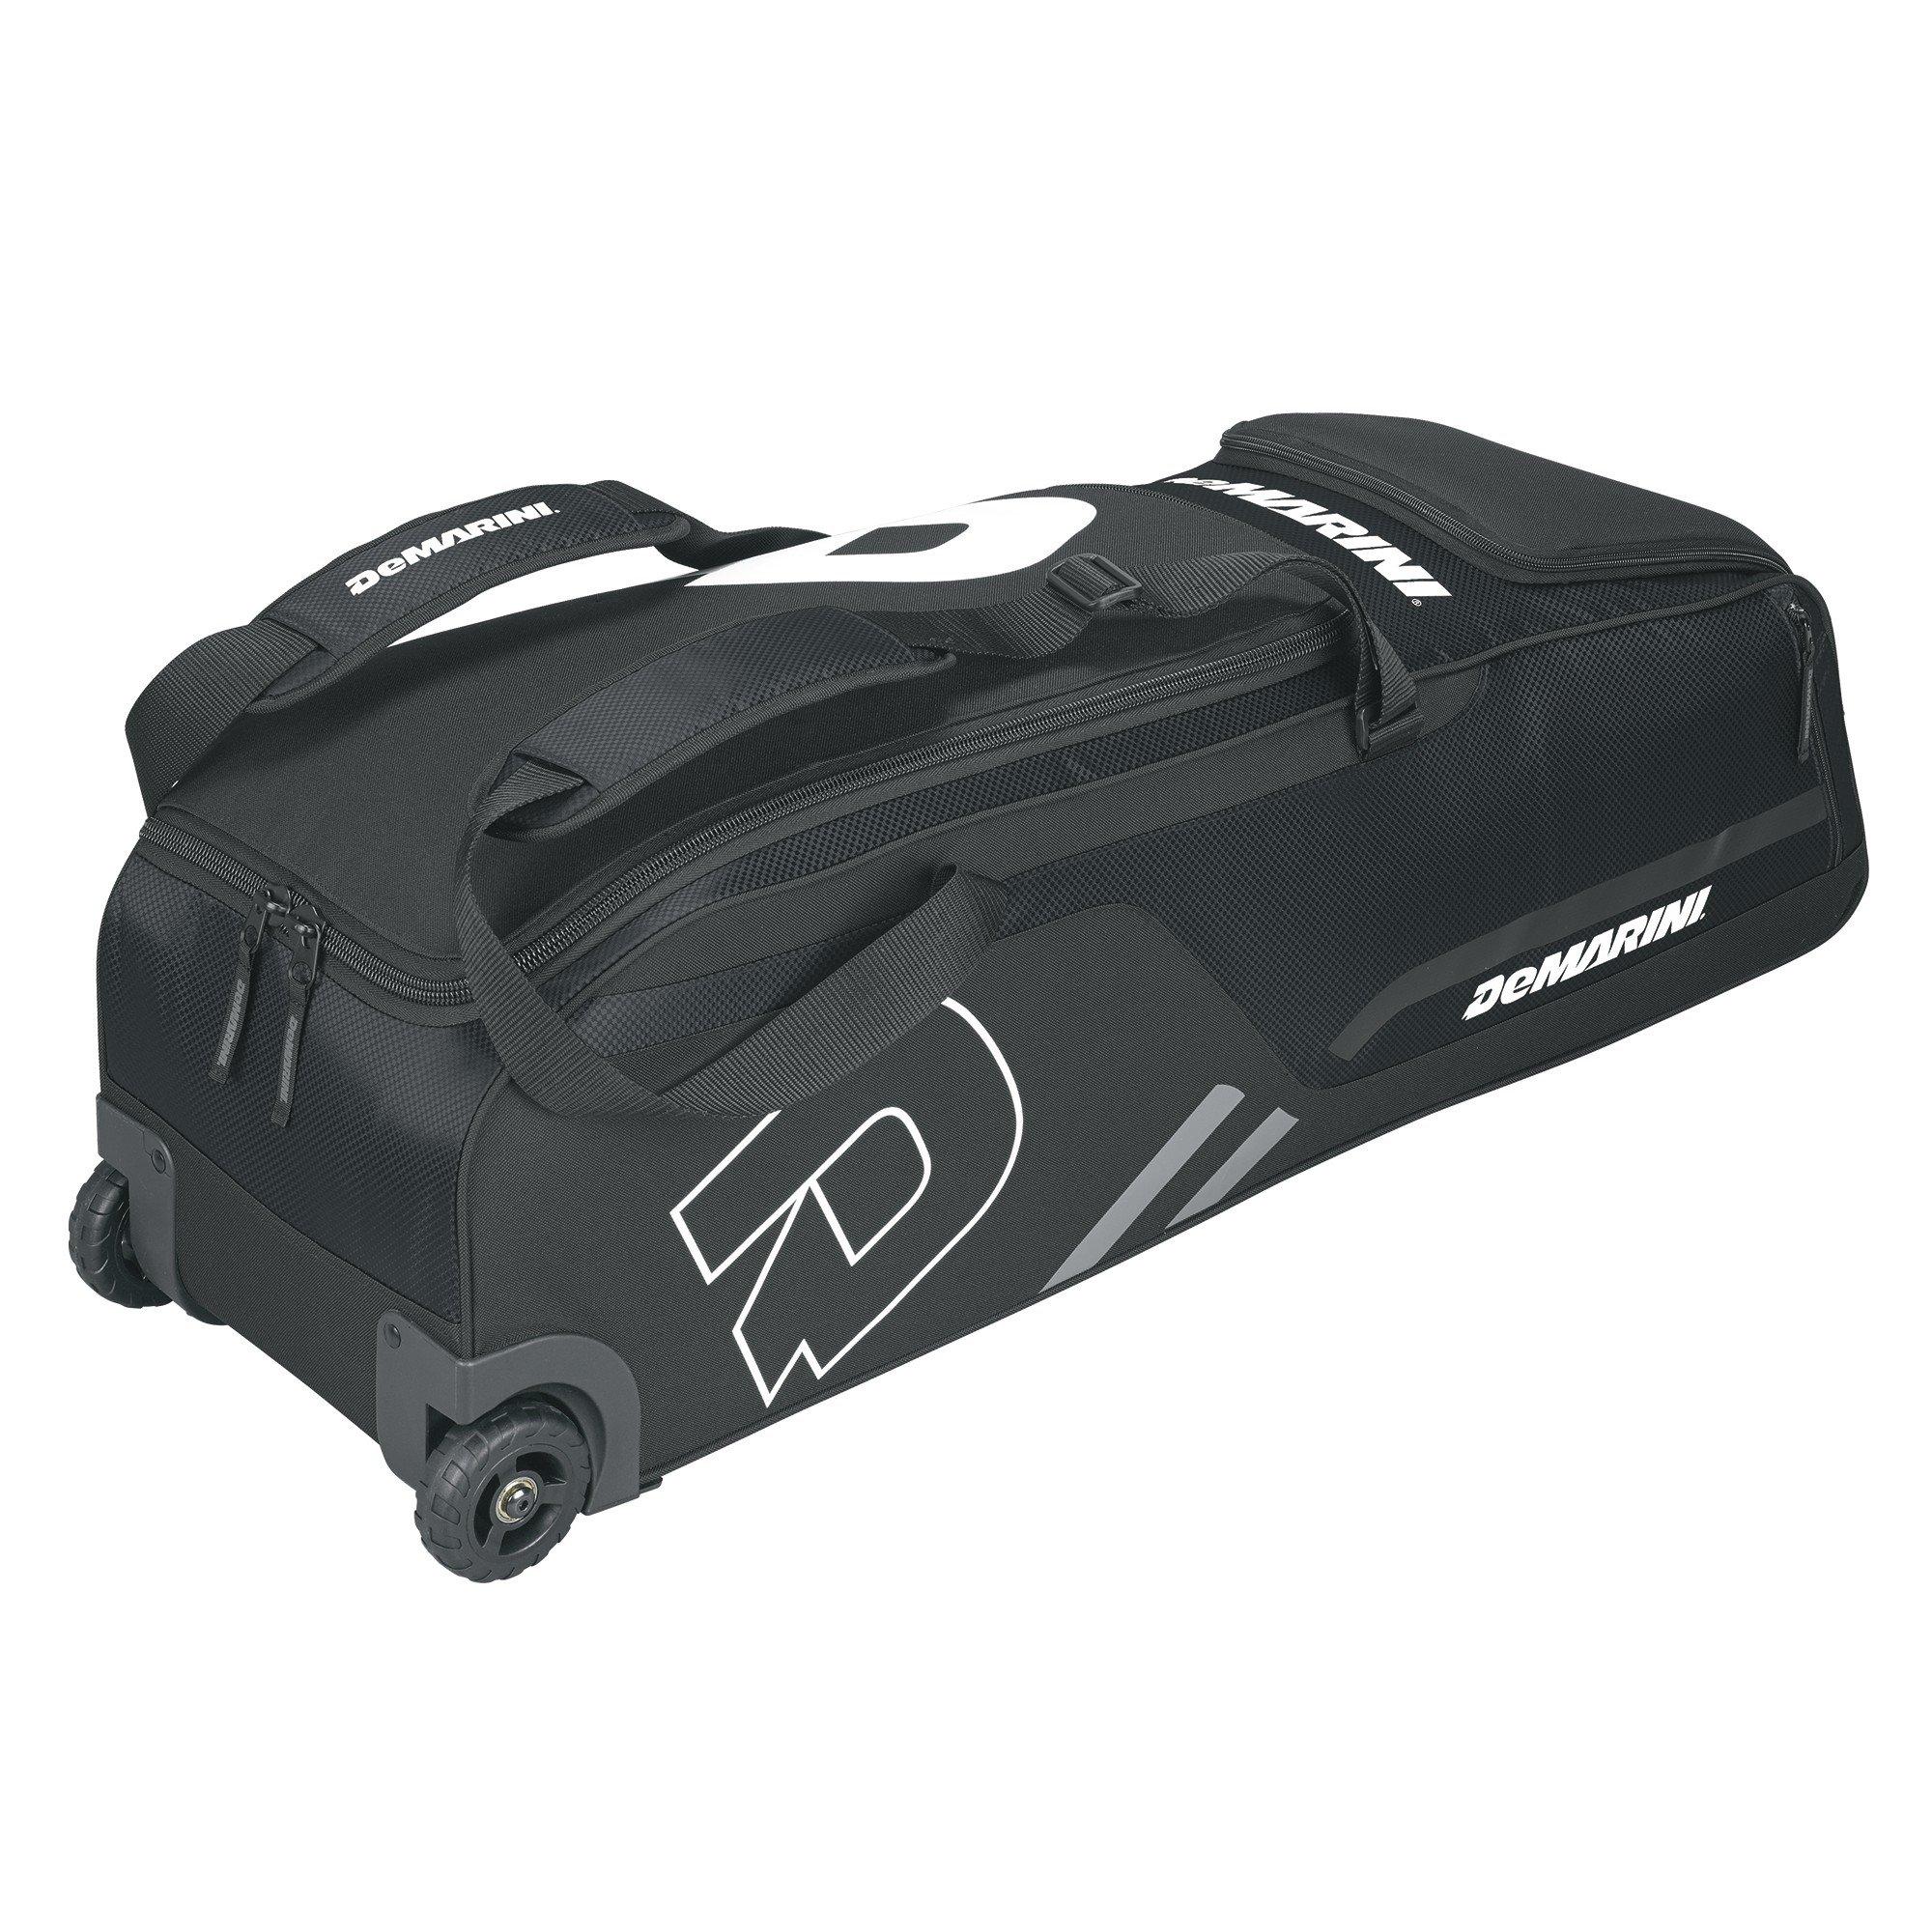 DeMarini Momentum Baseball Wheeled Bag-Black by DeMarini